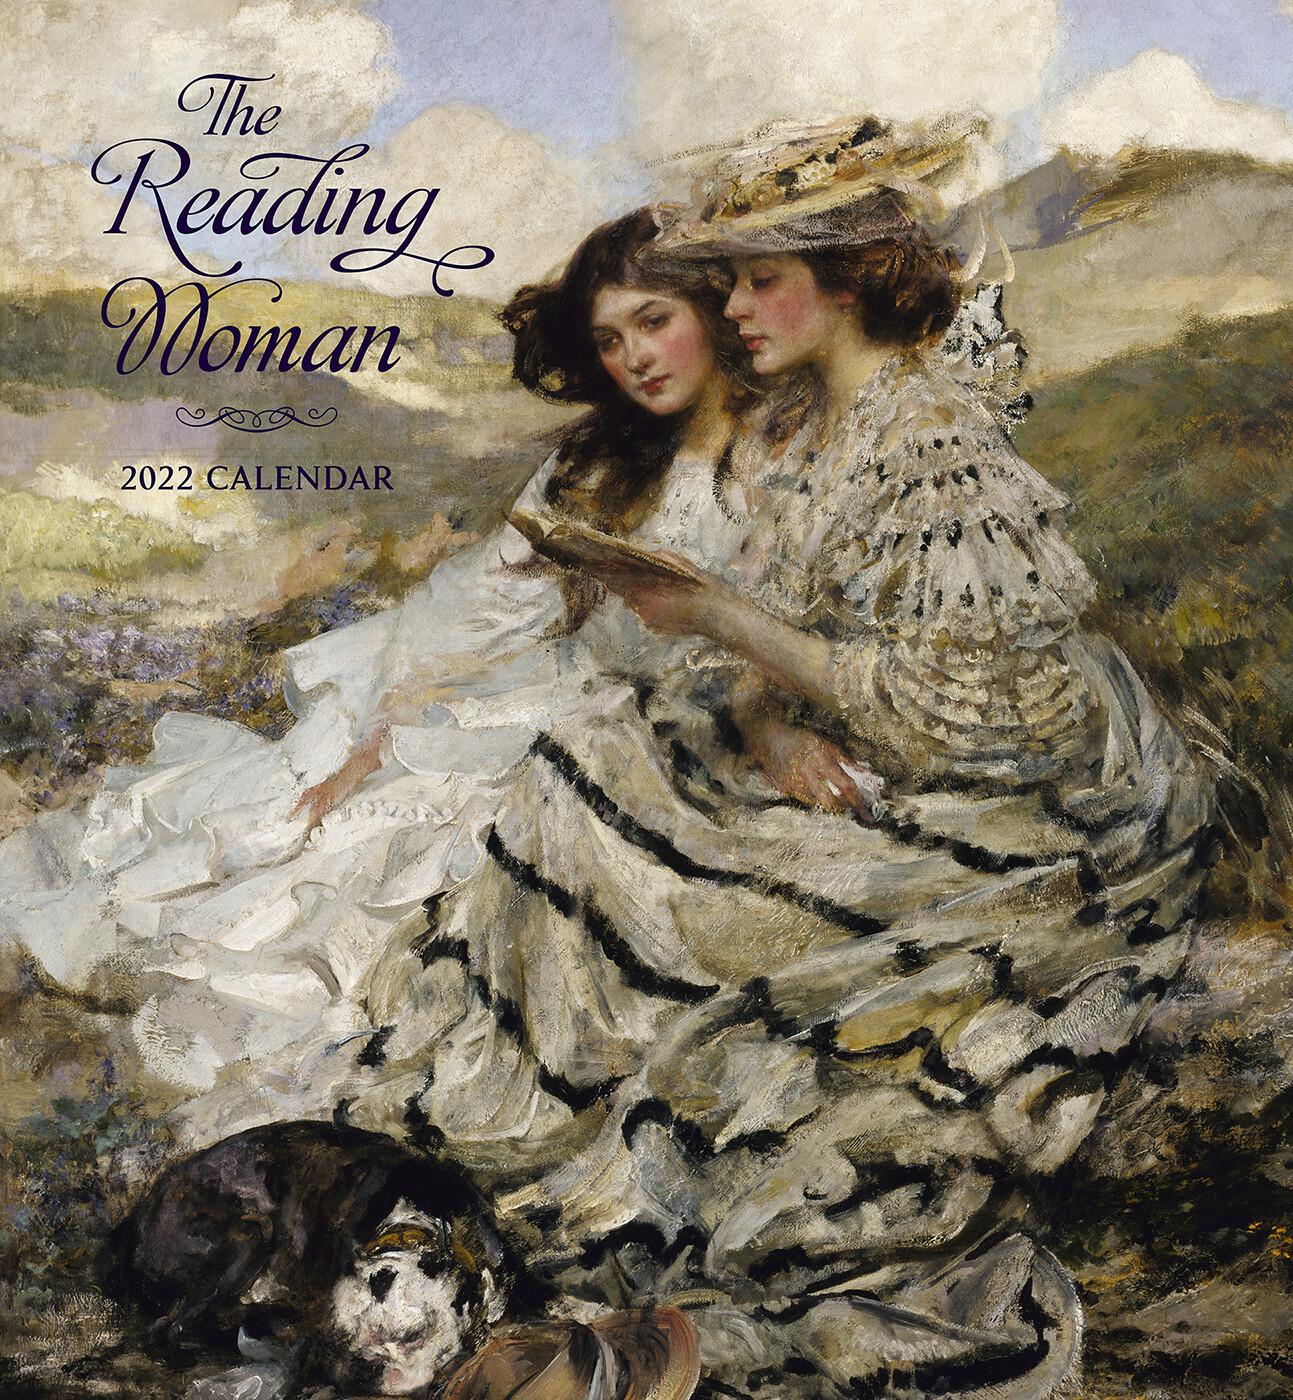 The Reading Woman 2022 Wall Calendar